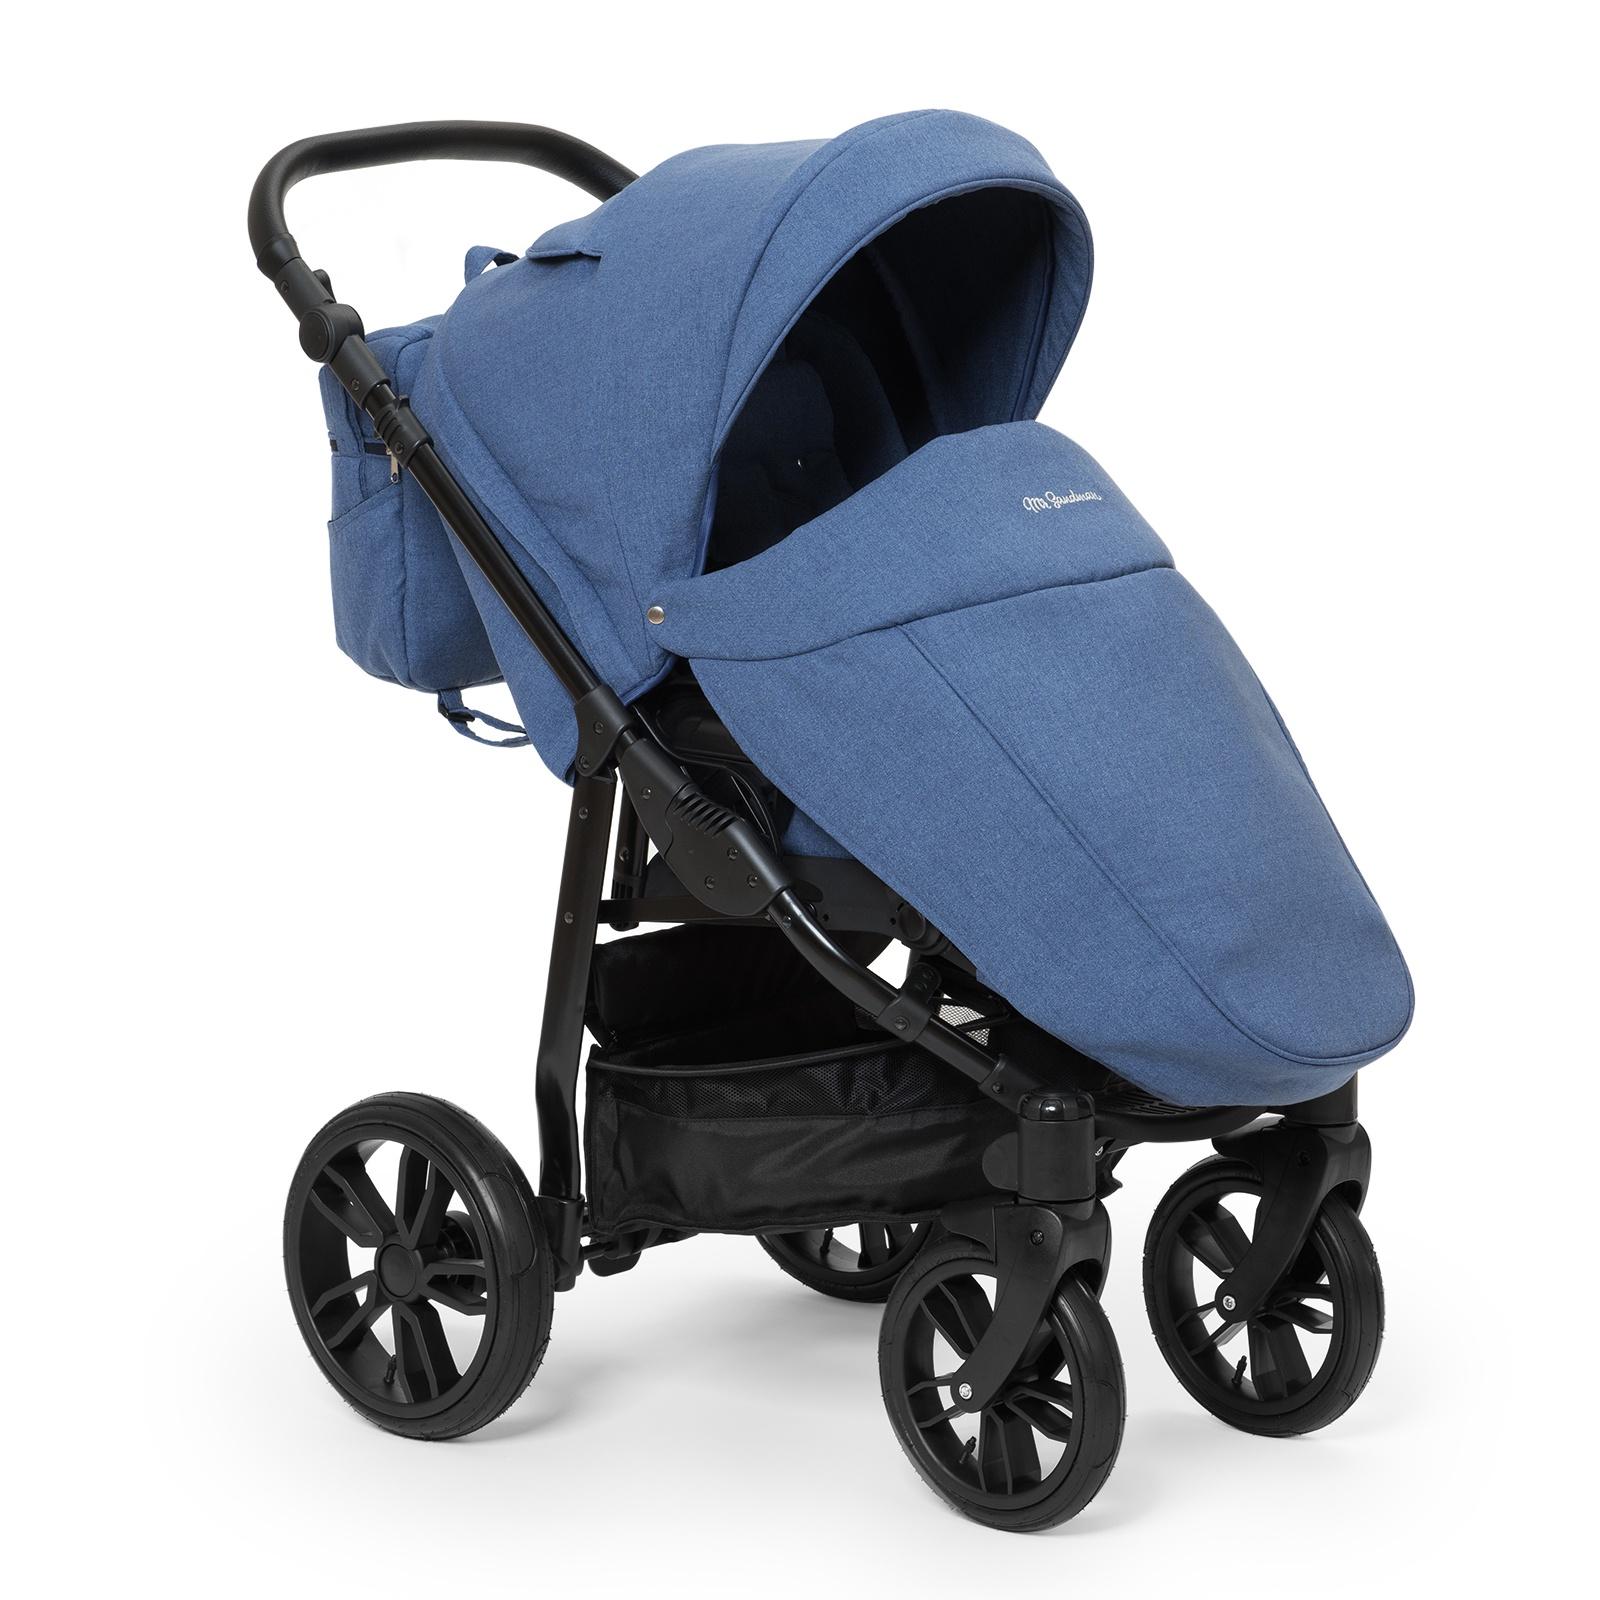 Коляска прогулочная Mr Sandman Vortex, цвет: синий коляска mr sandman guardian 2 в 1 графит серый kmsg 043601